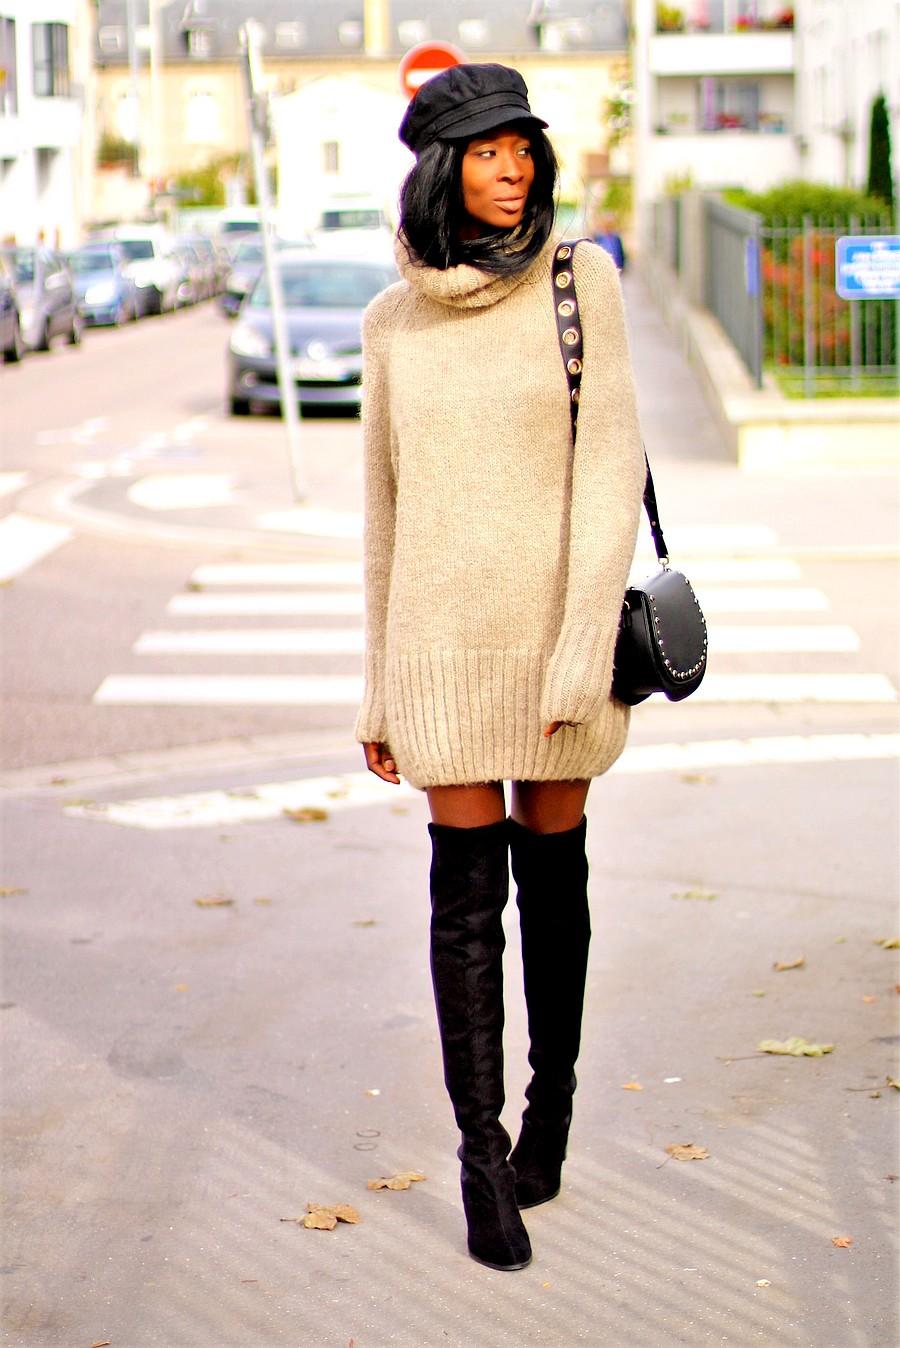 tendance-casquette-marin-robe-pull-zara-cuissardes